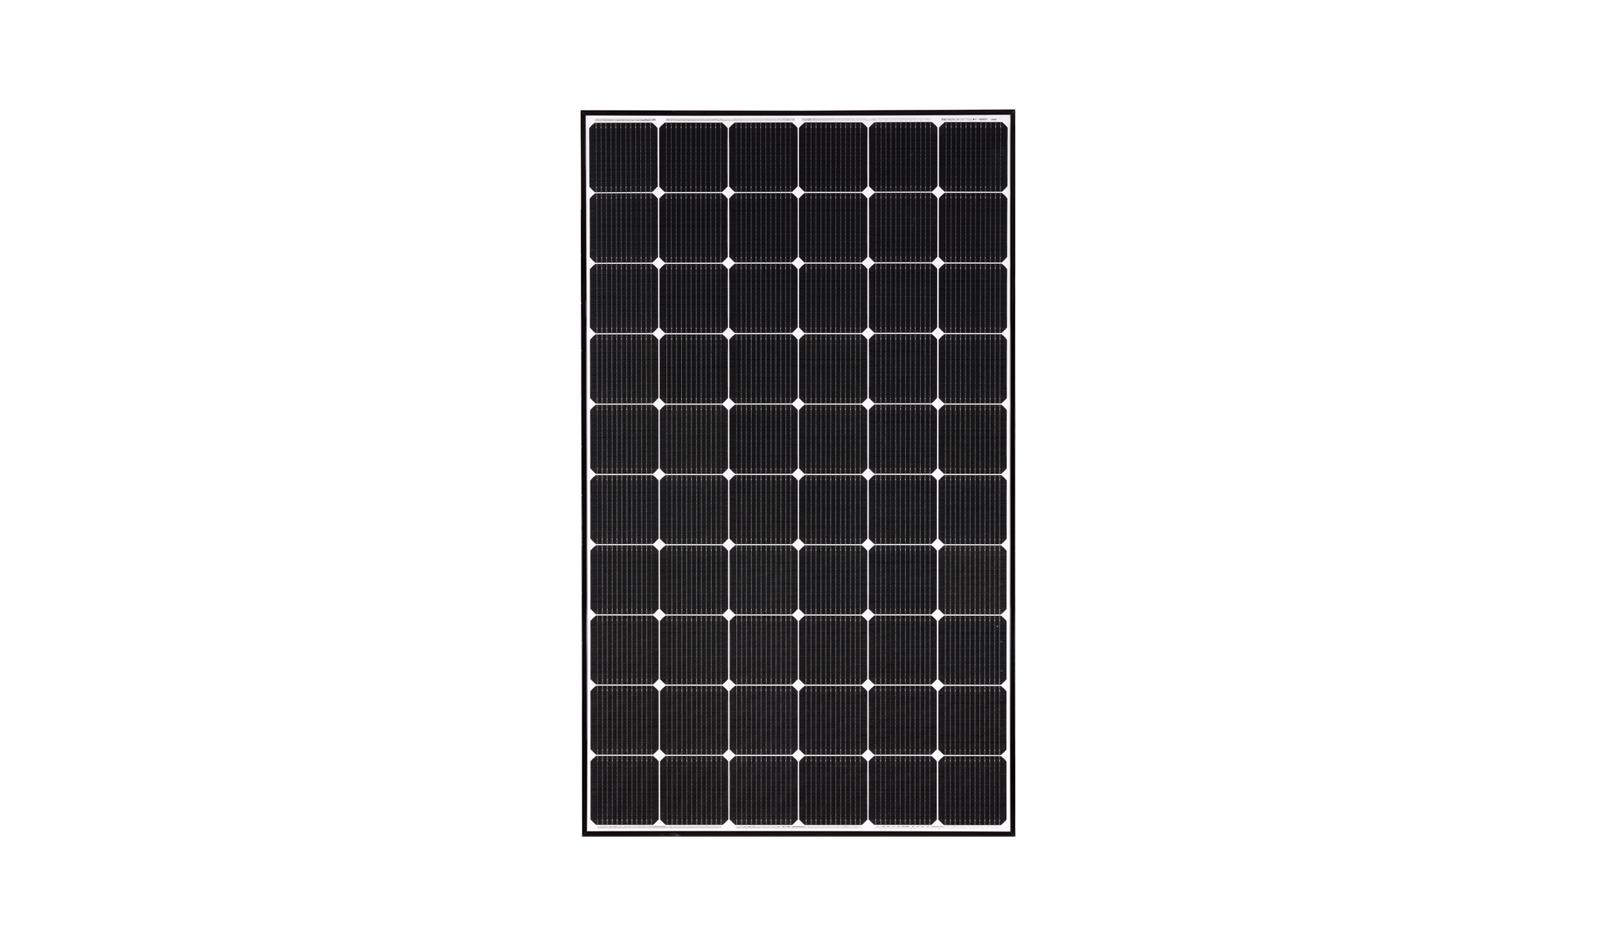 LG NeON 2 335W 60 Cell Mono 1000V BLK/WHT Solar Panel, LG335N1C-V5